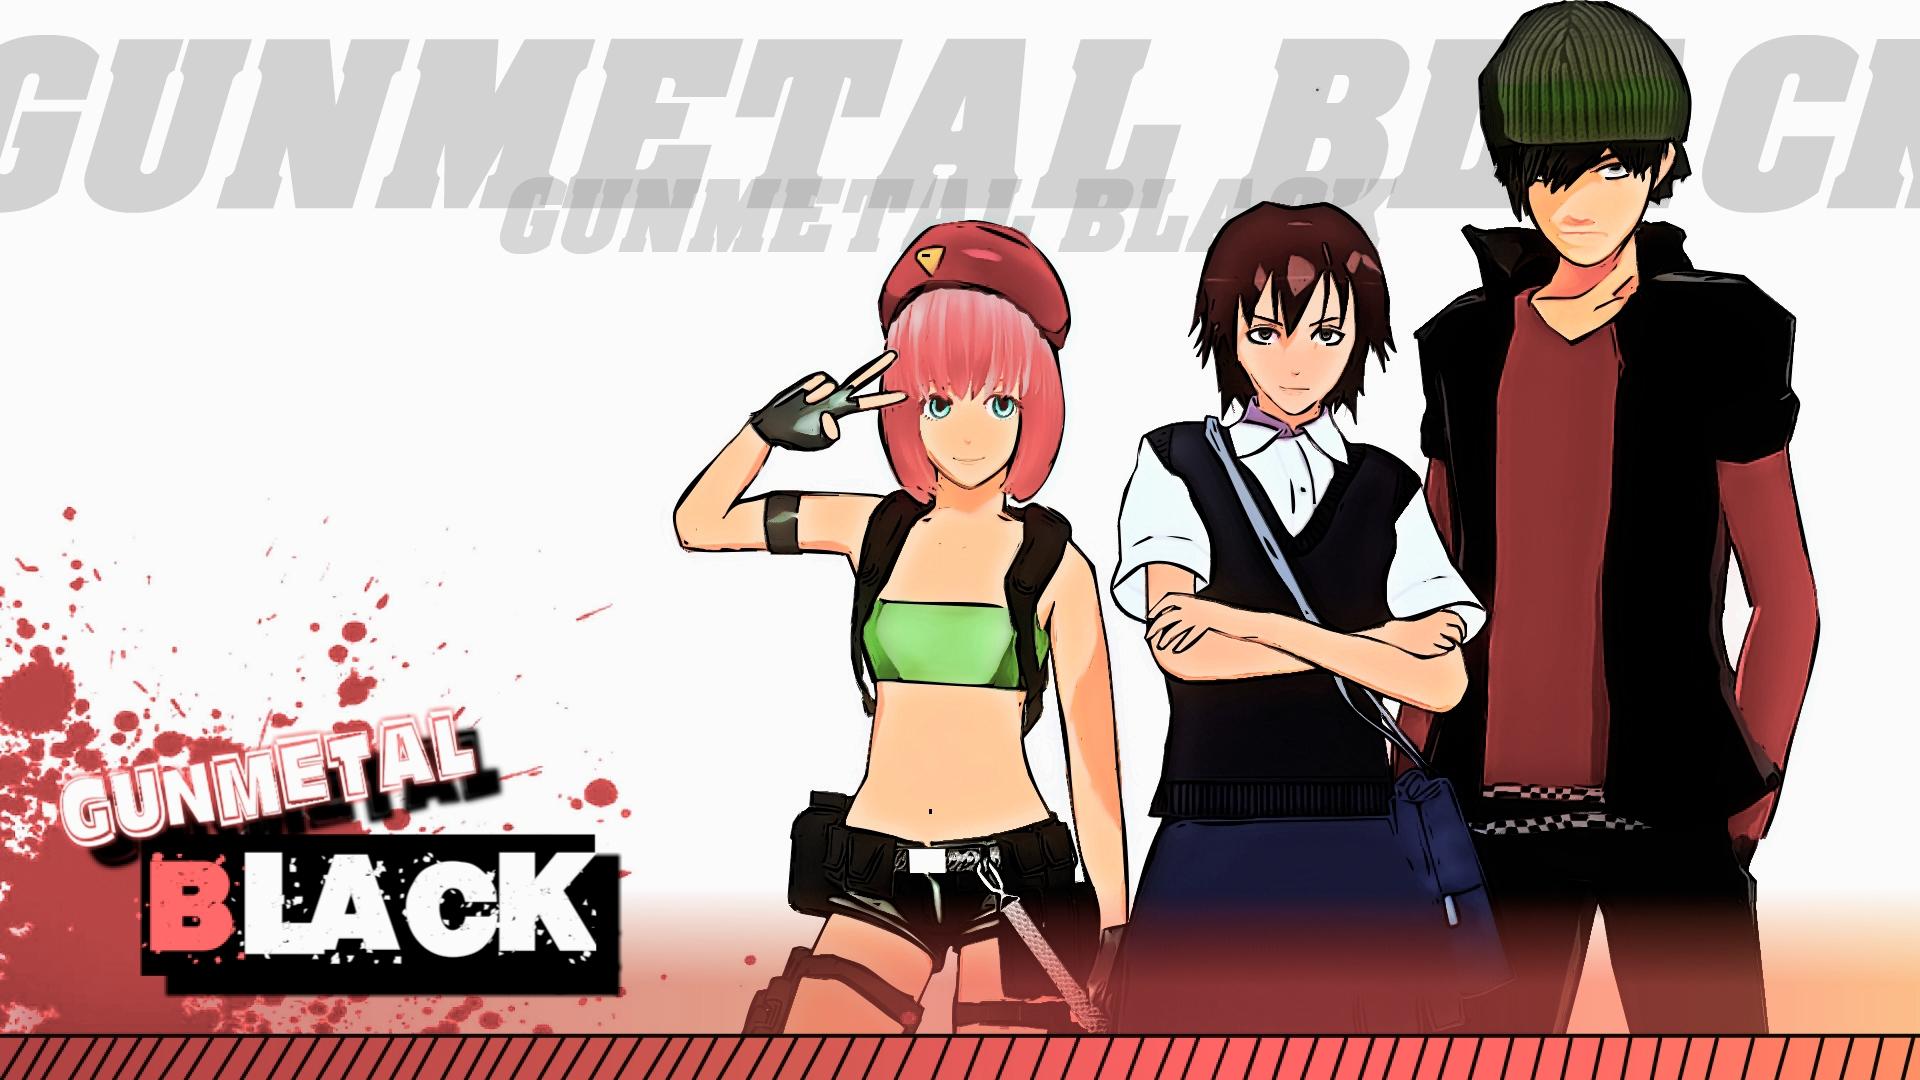 Gunmetal Black